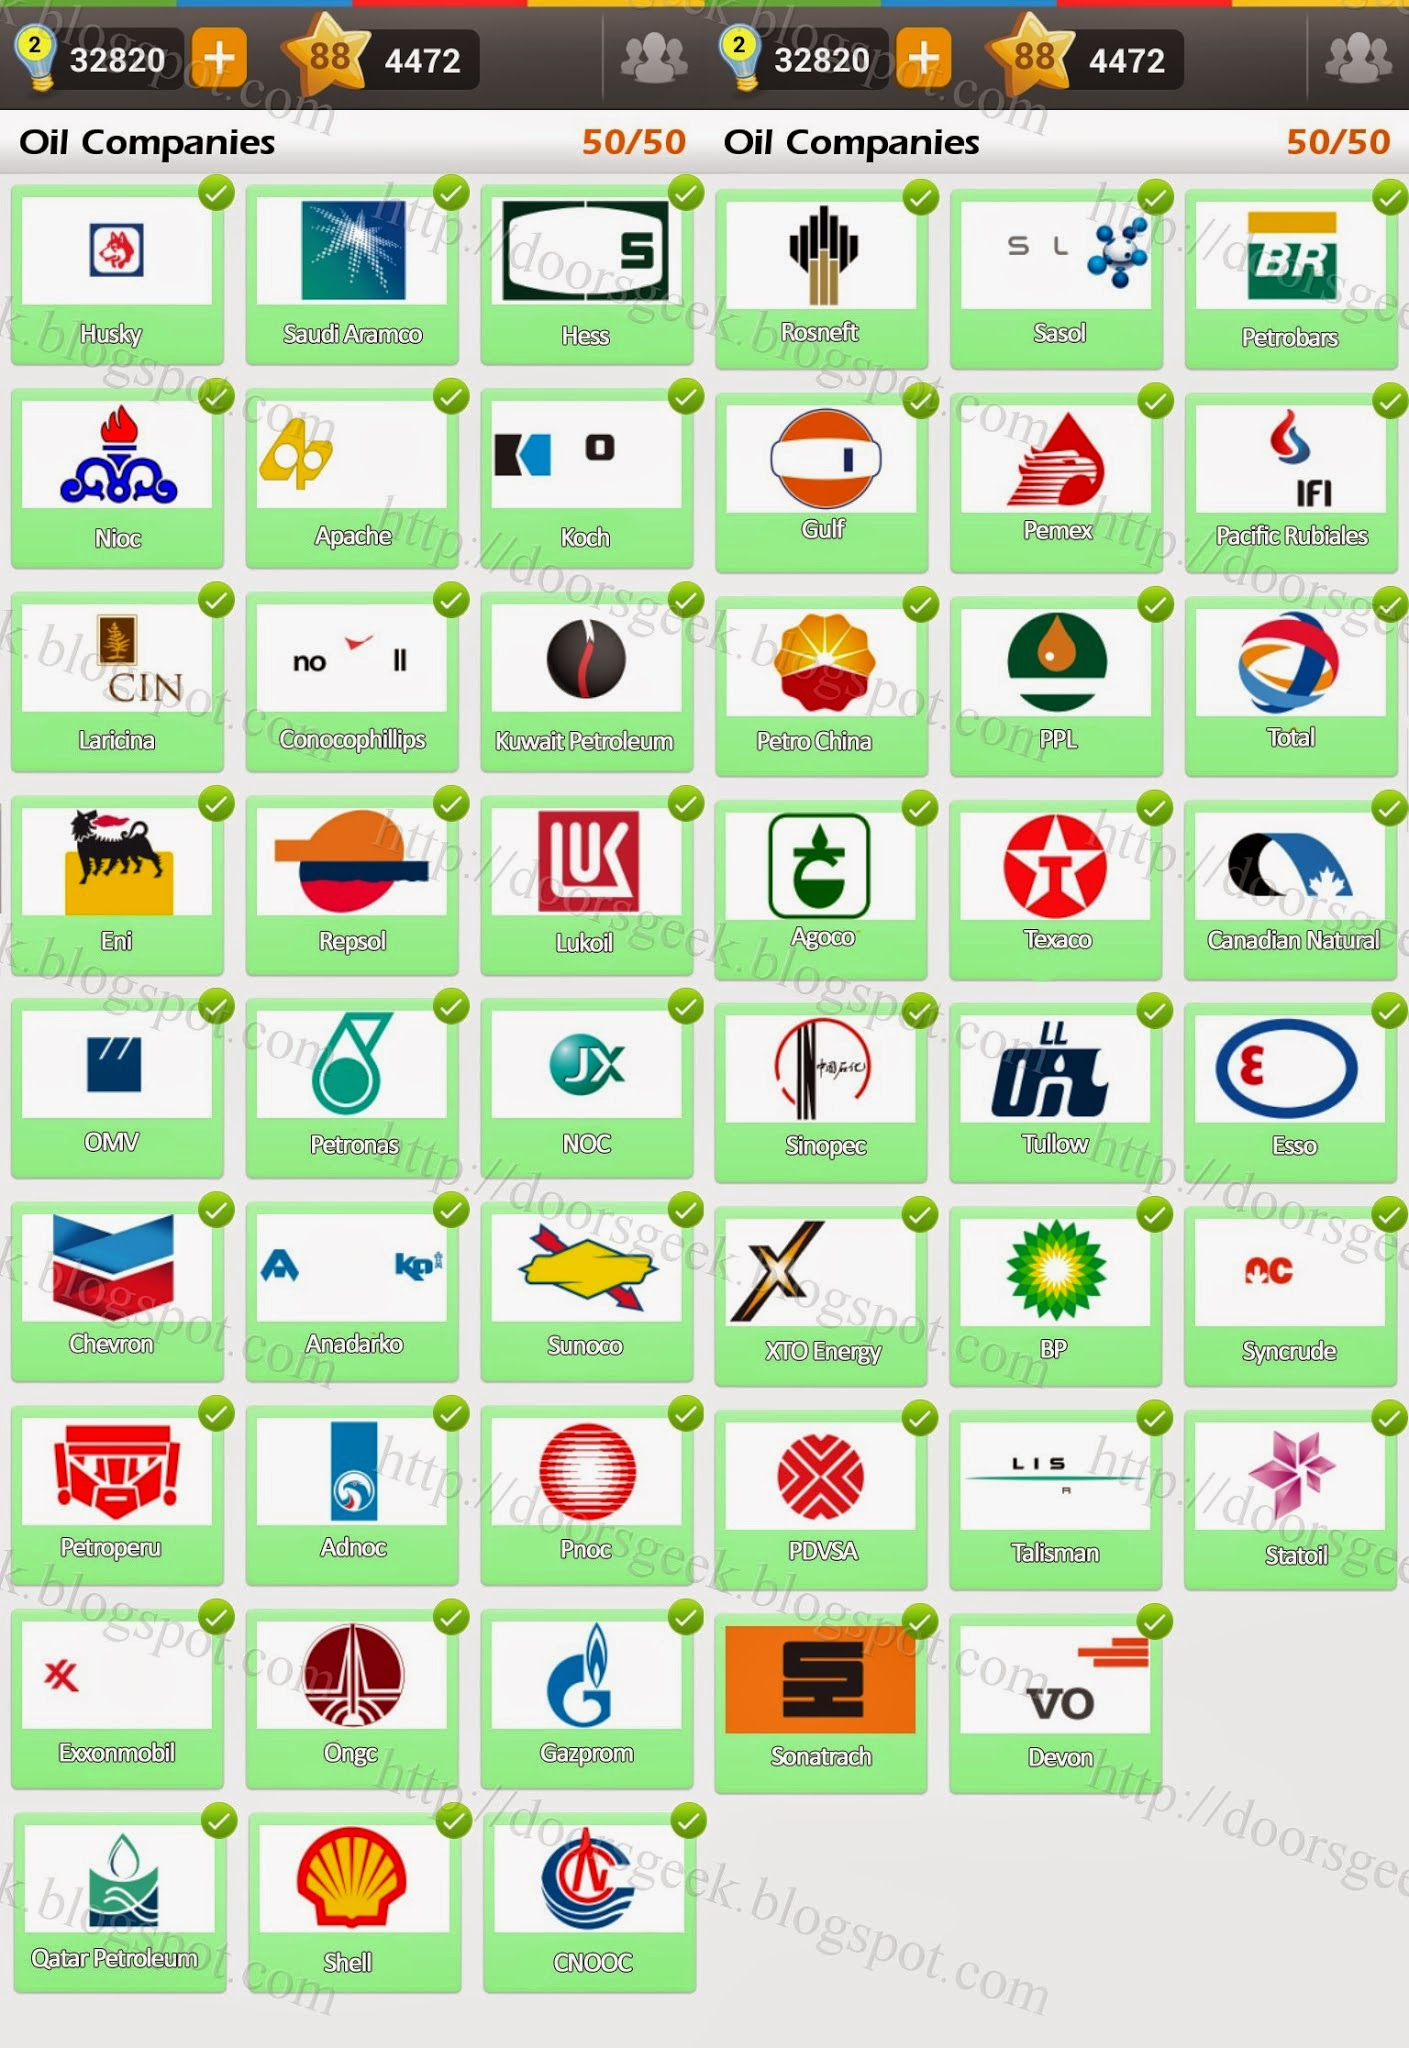 Préférence Logo Game: Guess the Brand [Bonus] Oil Companies ~ Doors Geek OT15